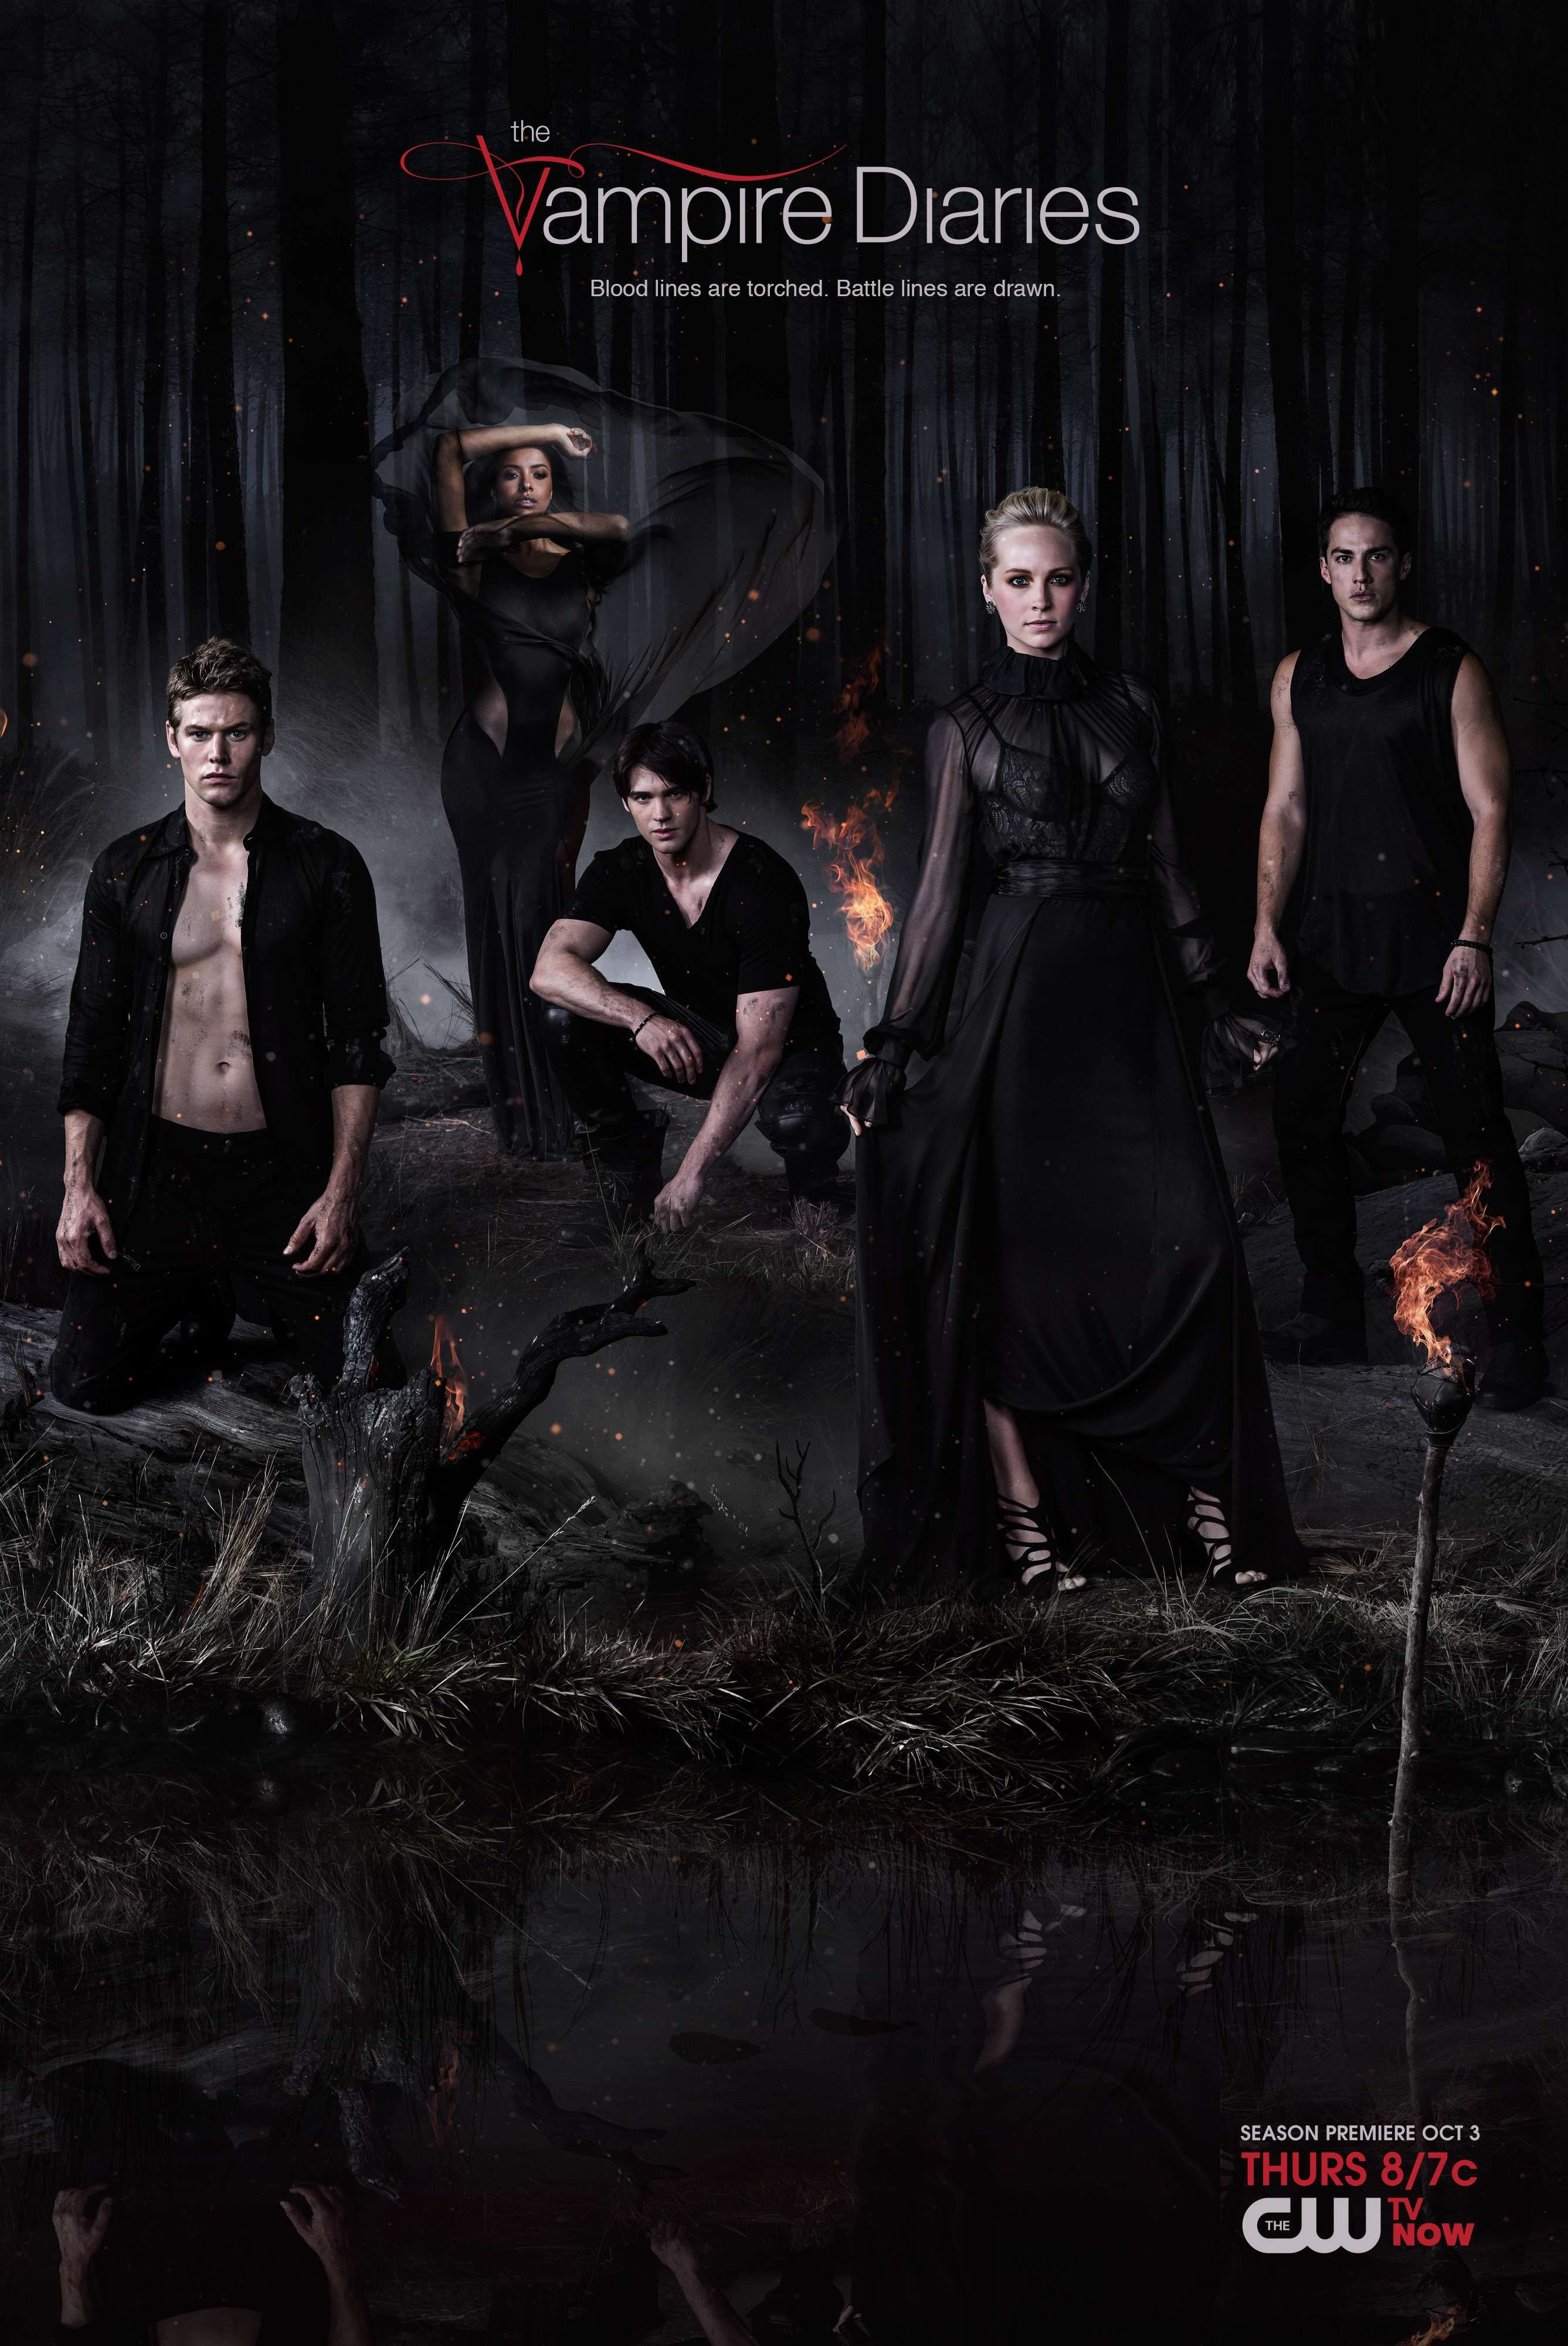 The Vampire Diaries Season 5 Poster Com Imagens Vampire